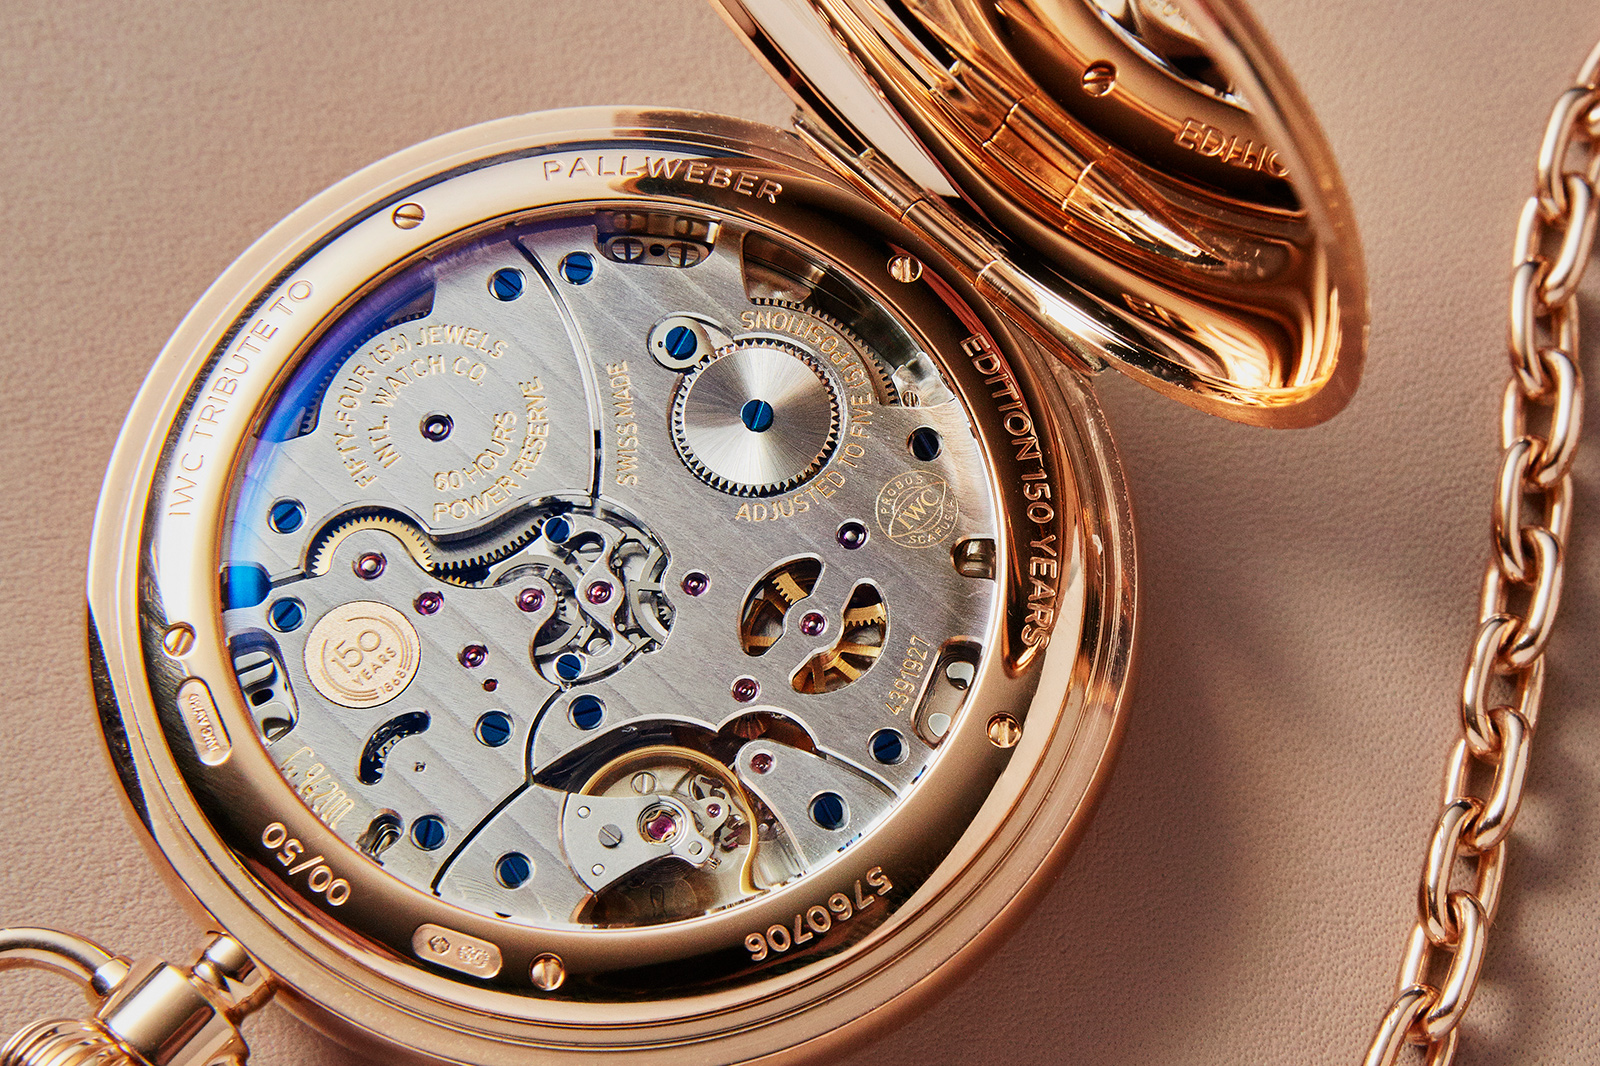 IWC Pallweber 150 Years Pocket Watch limited edition 1